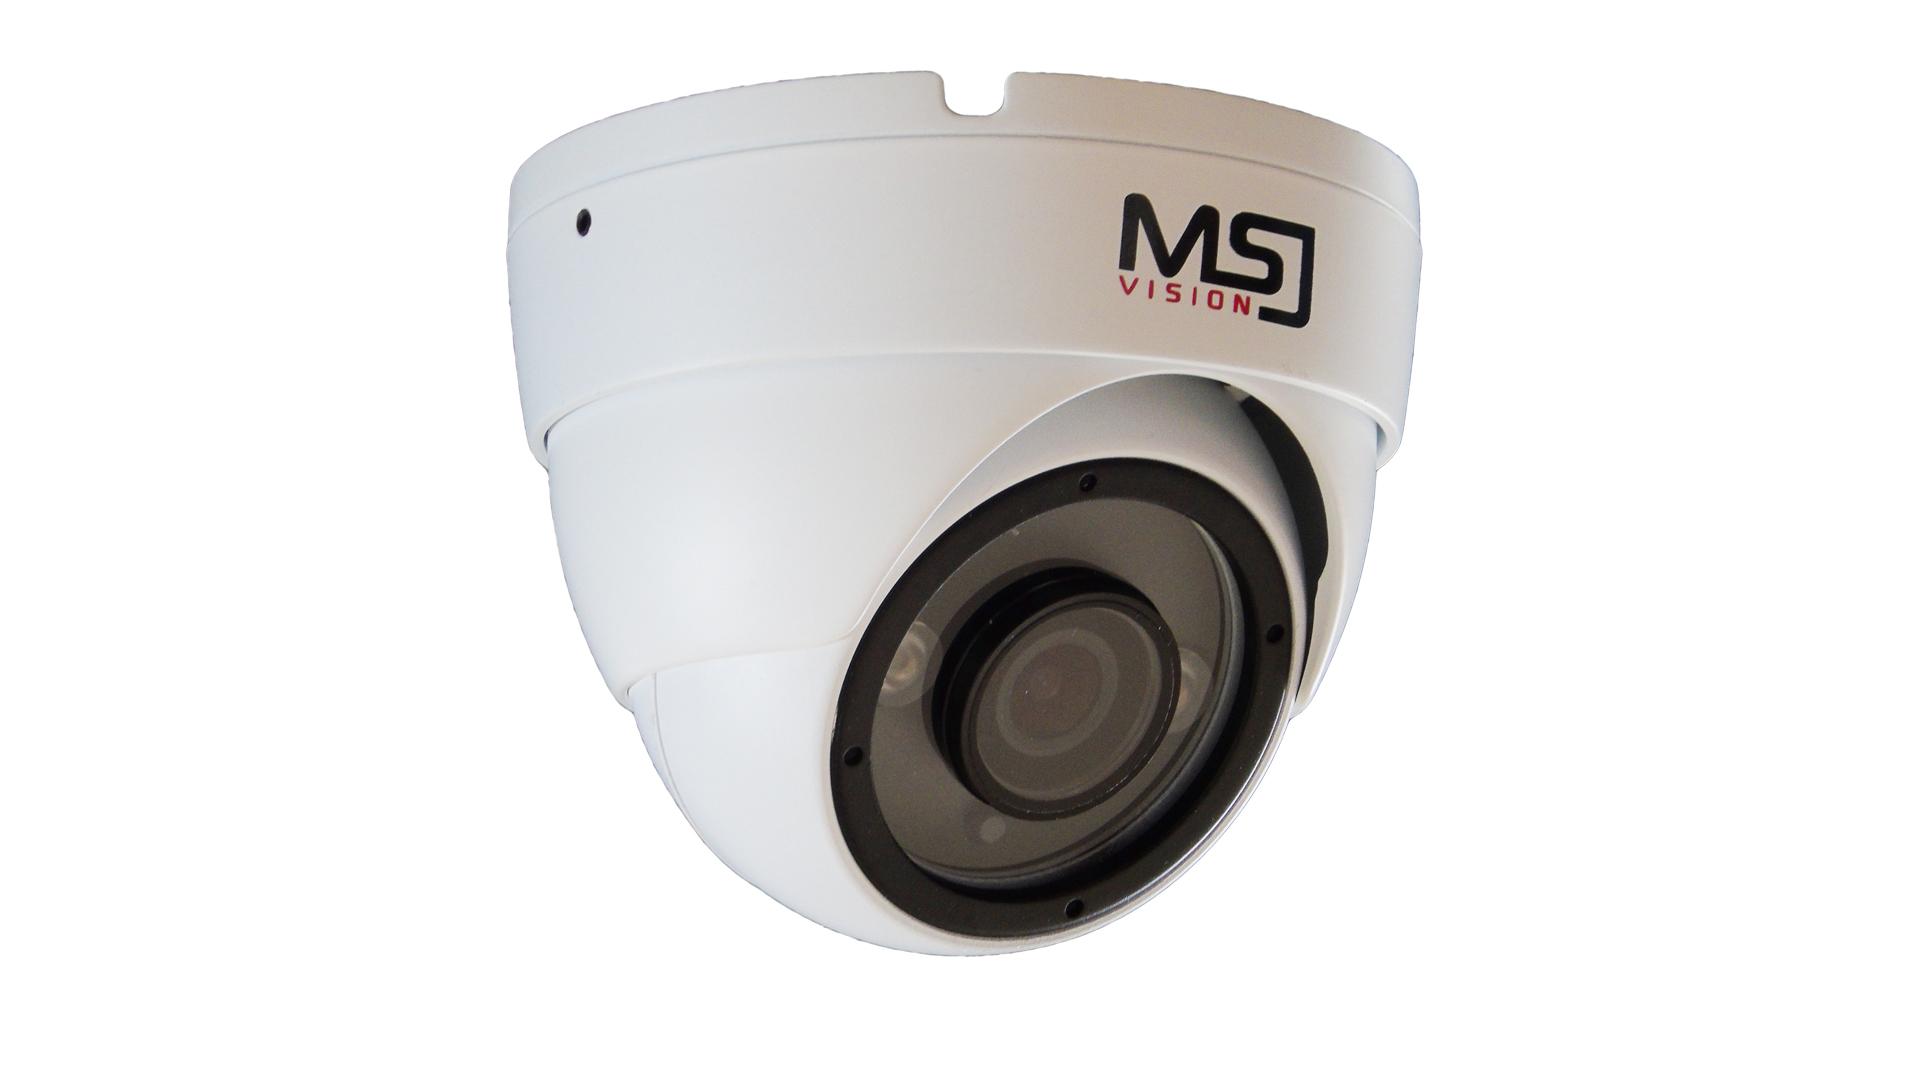 MSJ-HBR-4102W-AL1080P 2.8mm